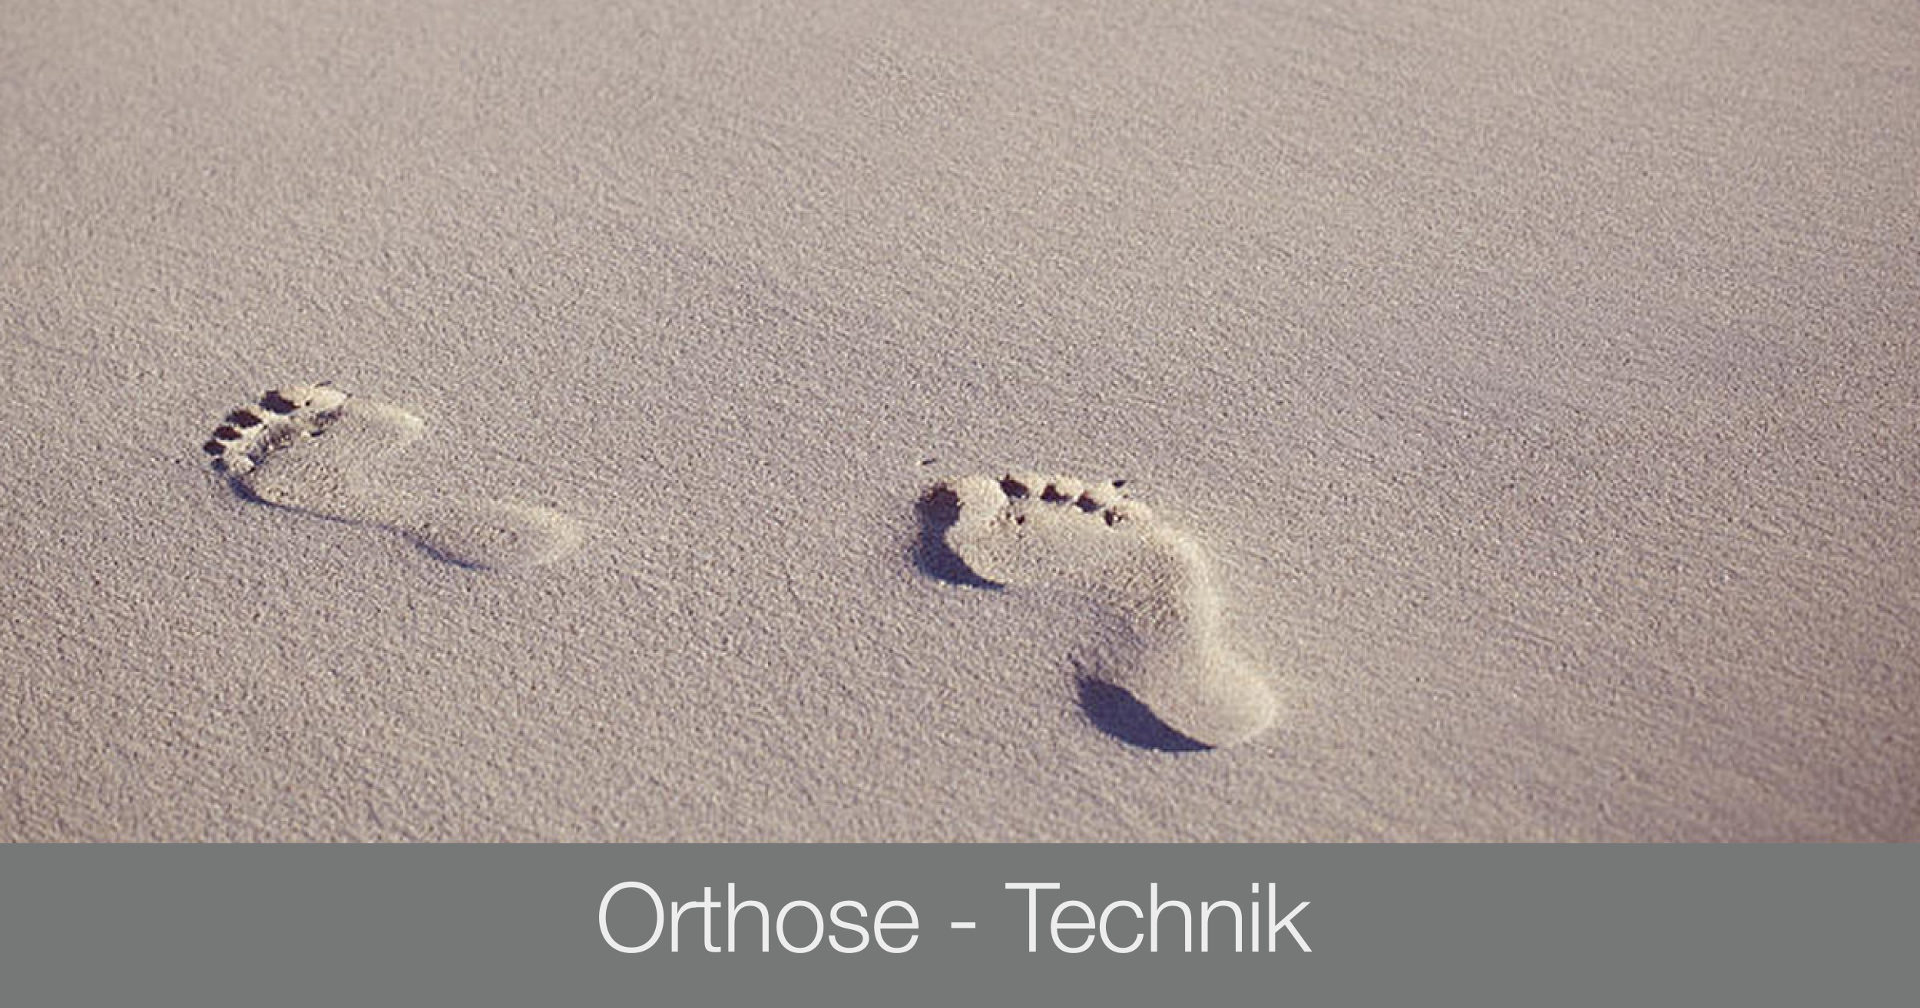 Ausbildung Fußpflege - Orthose-Technik - Kosmetikschule Schäfer